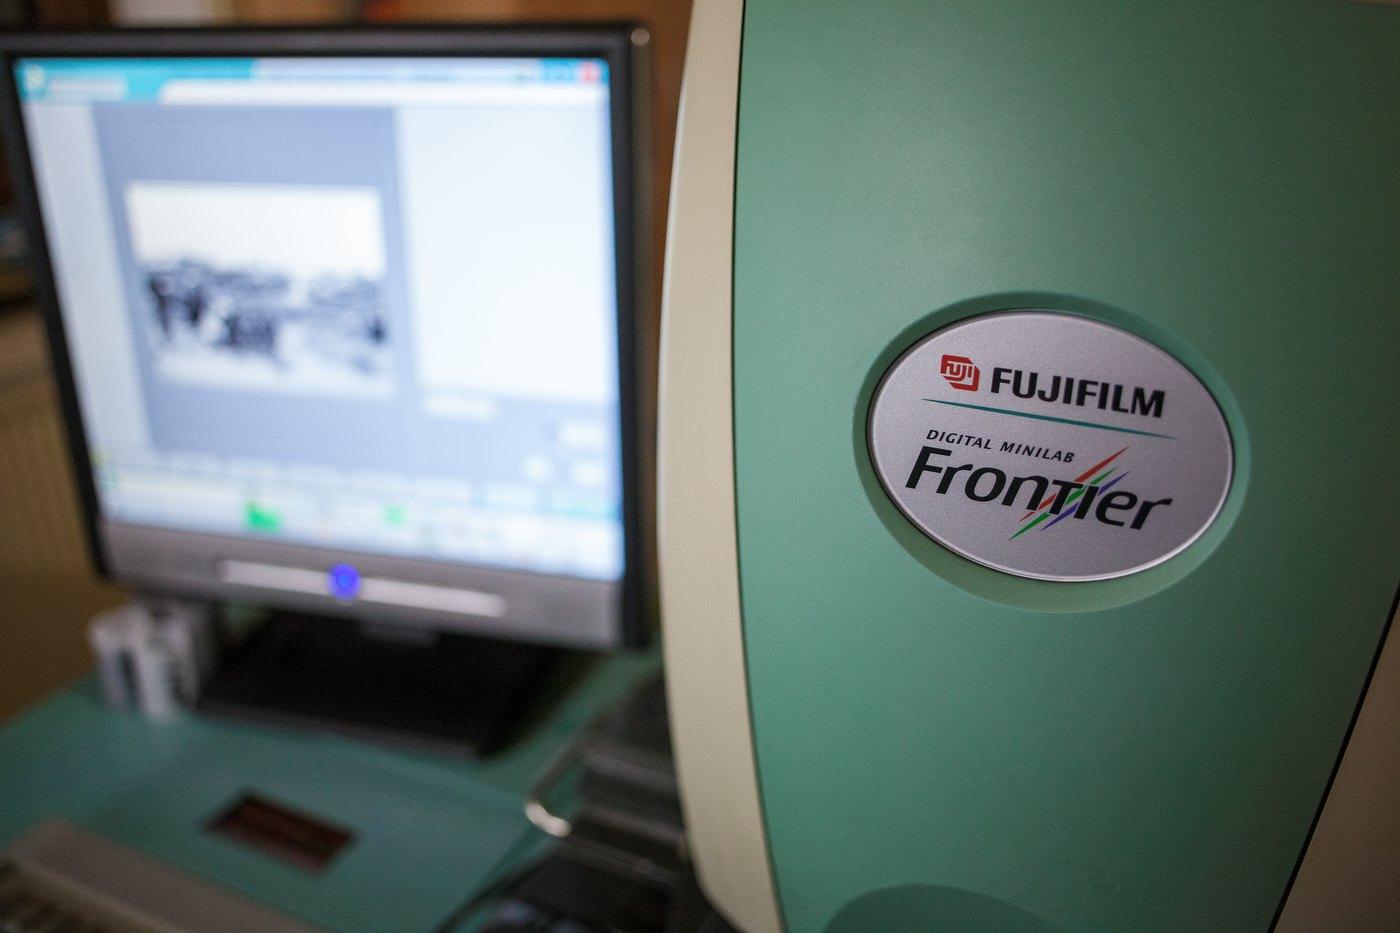 A Fuji Frontier SP-3000 scanner (image courtesy by meinfilmlab.de)